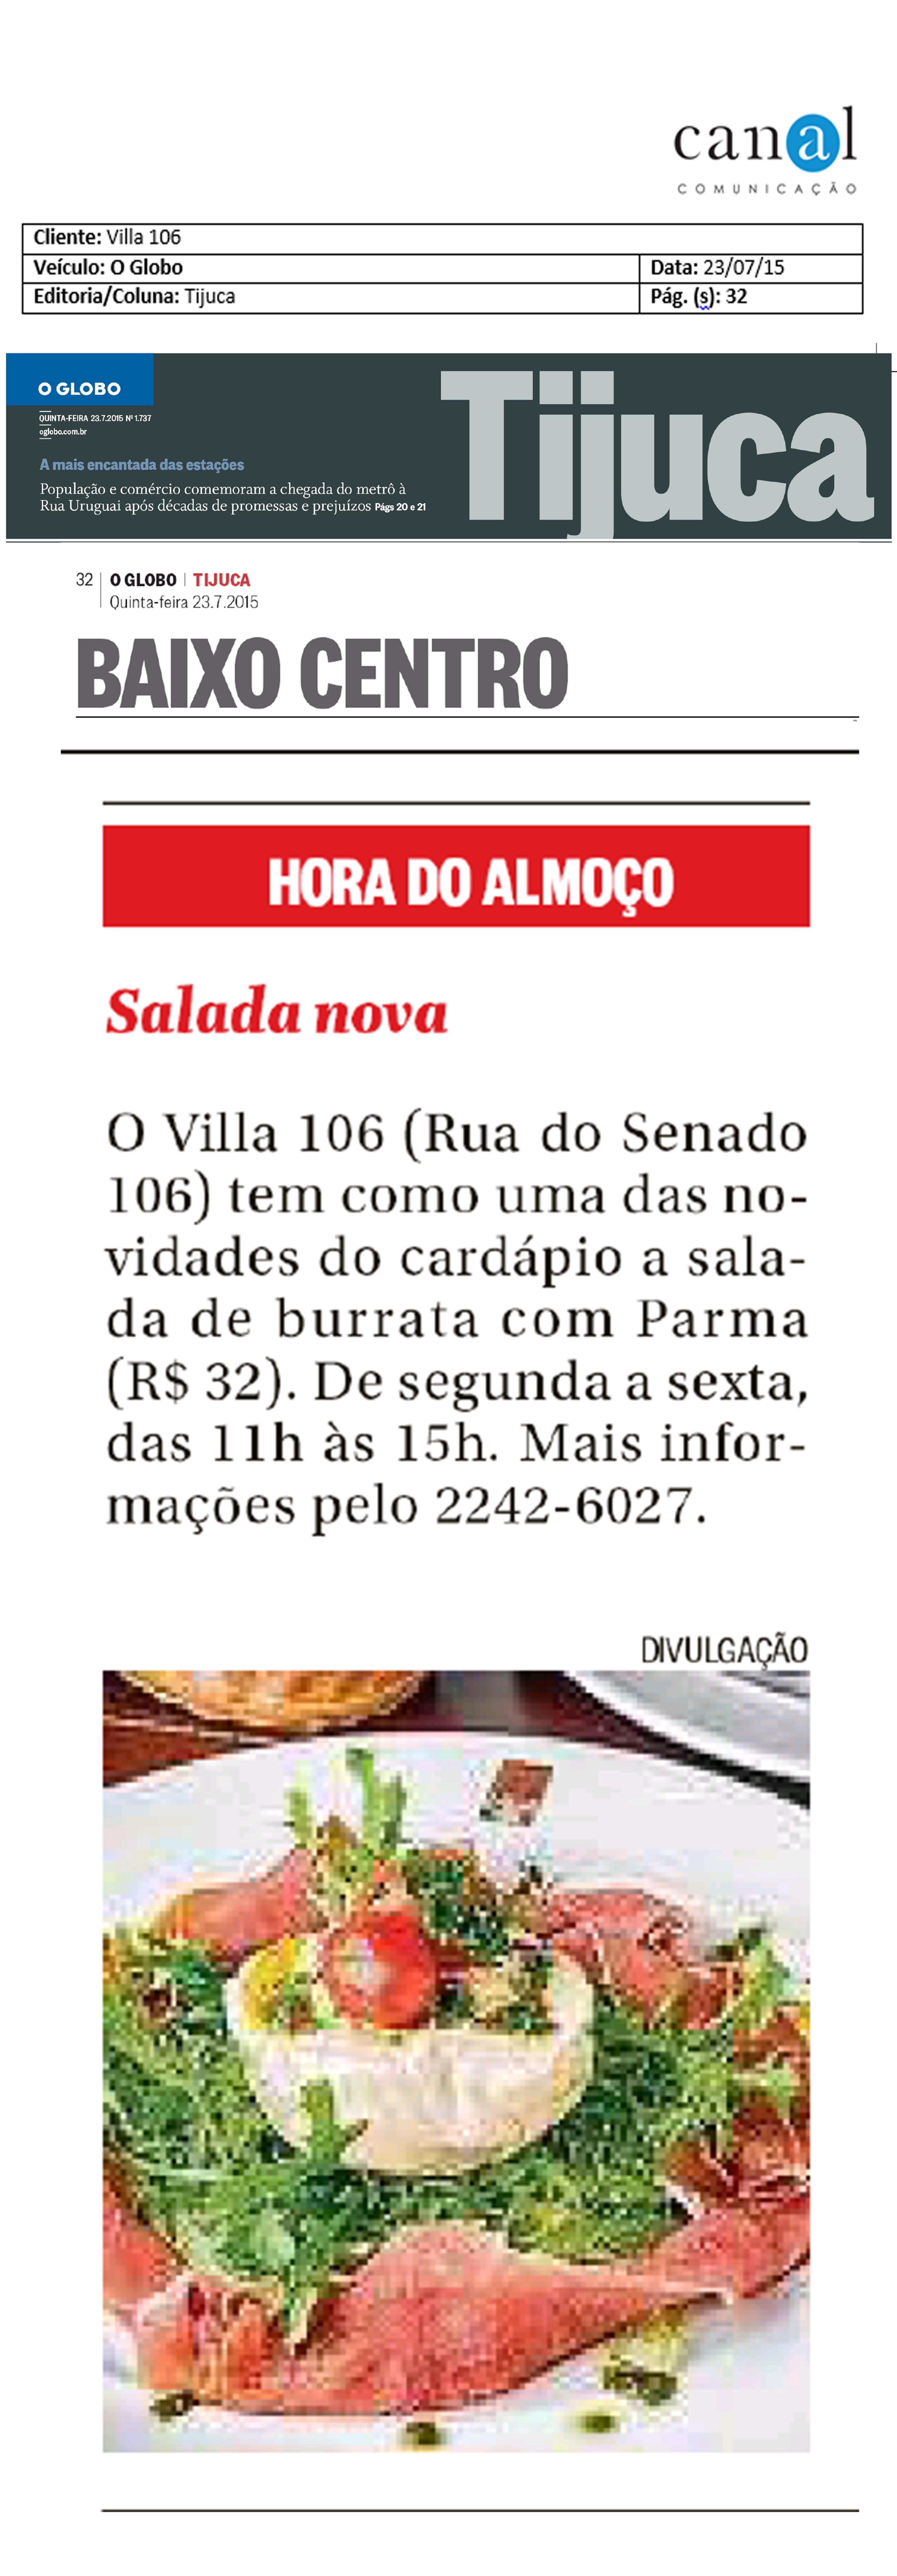 Villa-106_O-Globo_Tijuca_23-07-2015